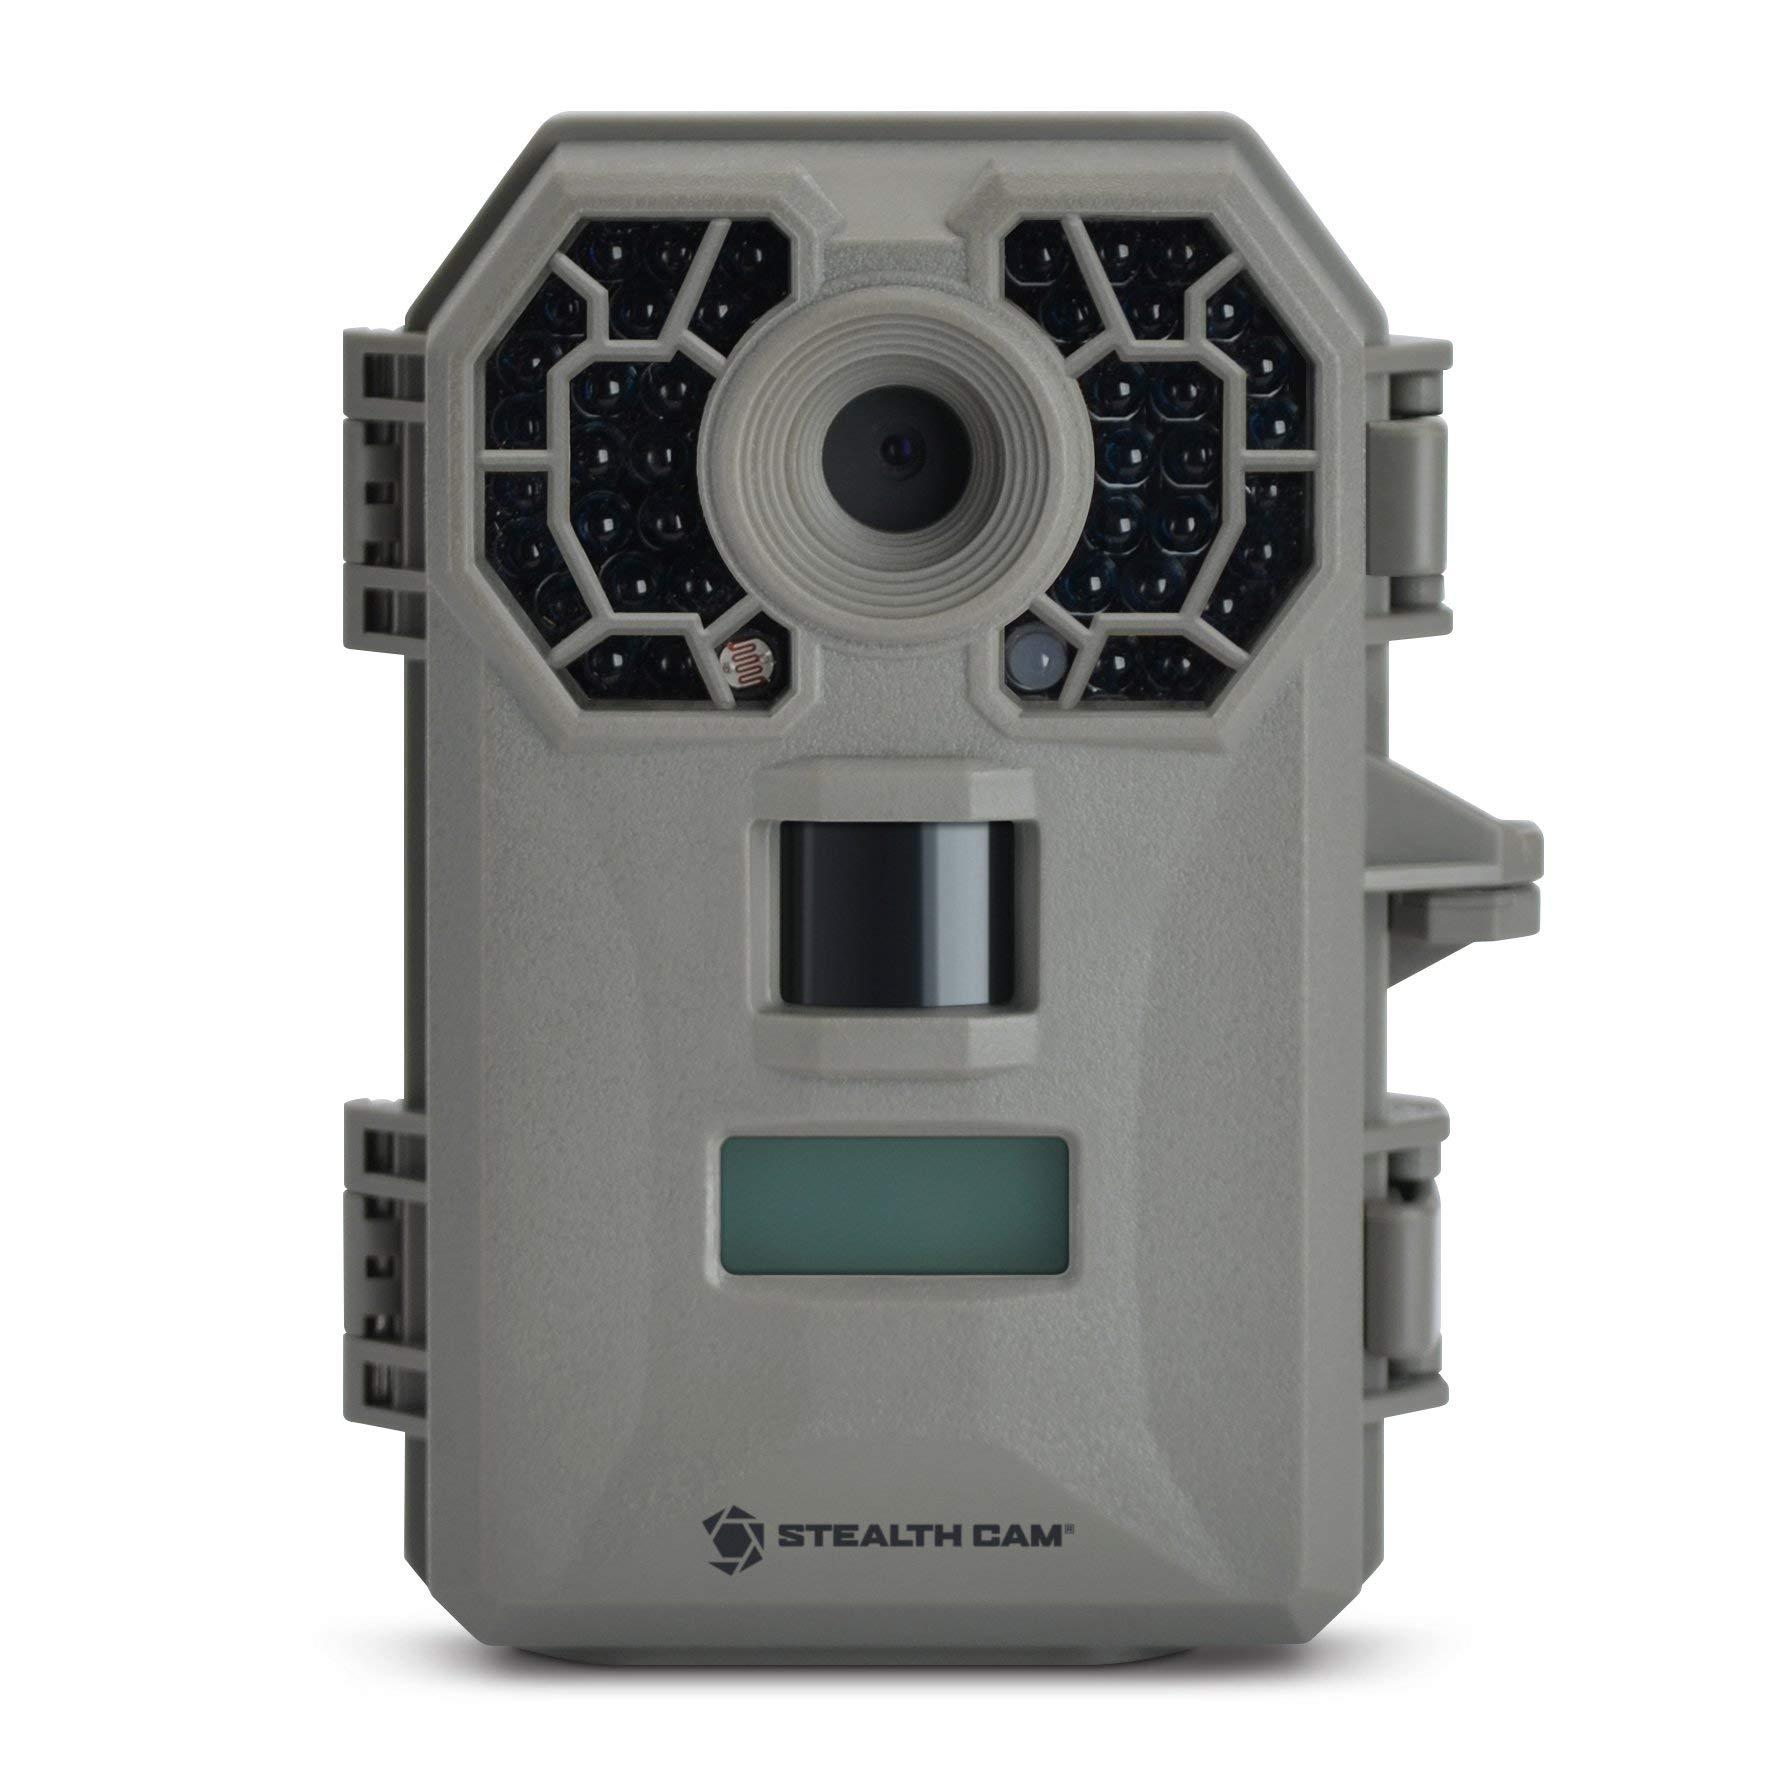 Stealth Cam G42 No-Glo Trail Game Camera STC-G42NG (Gray)